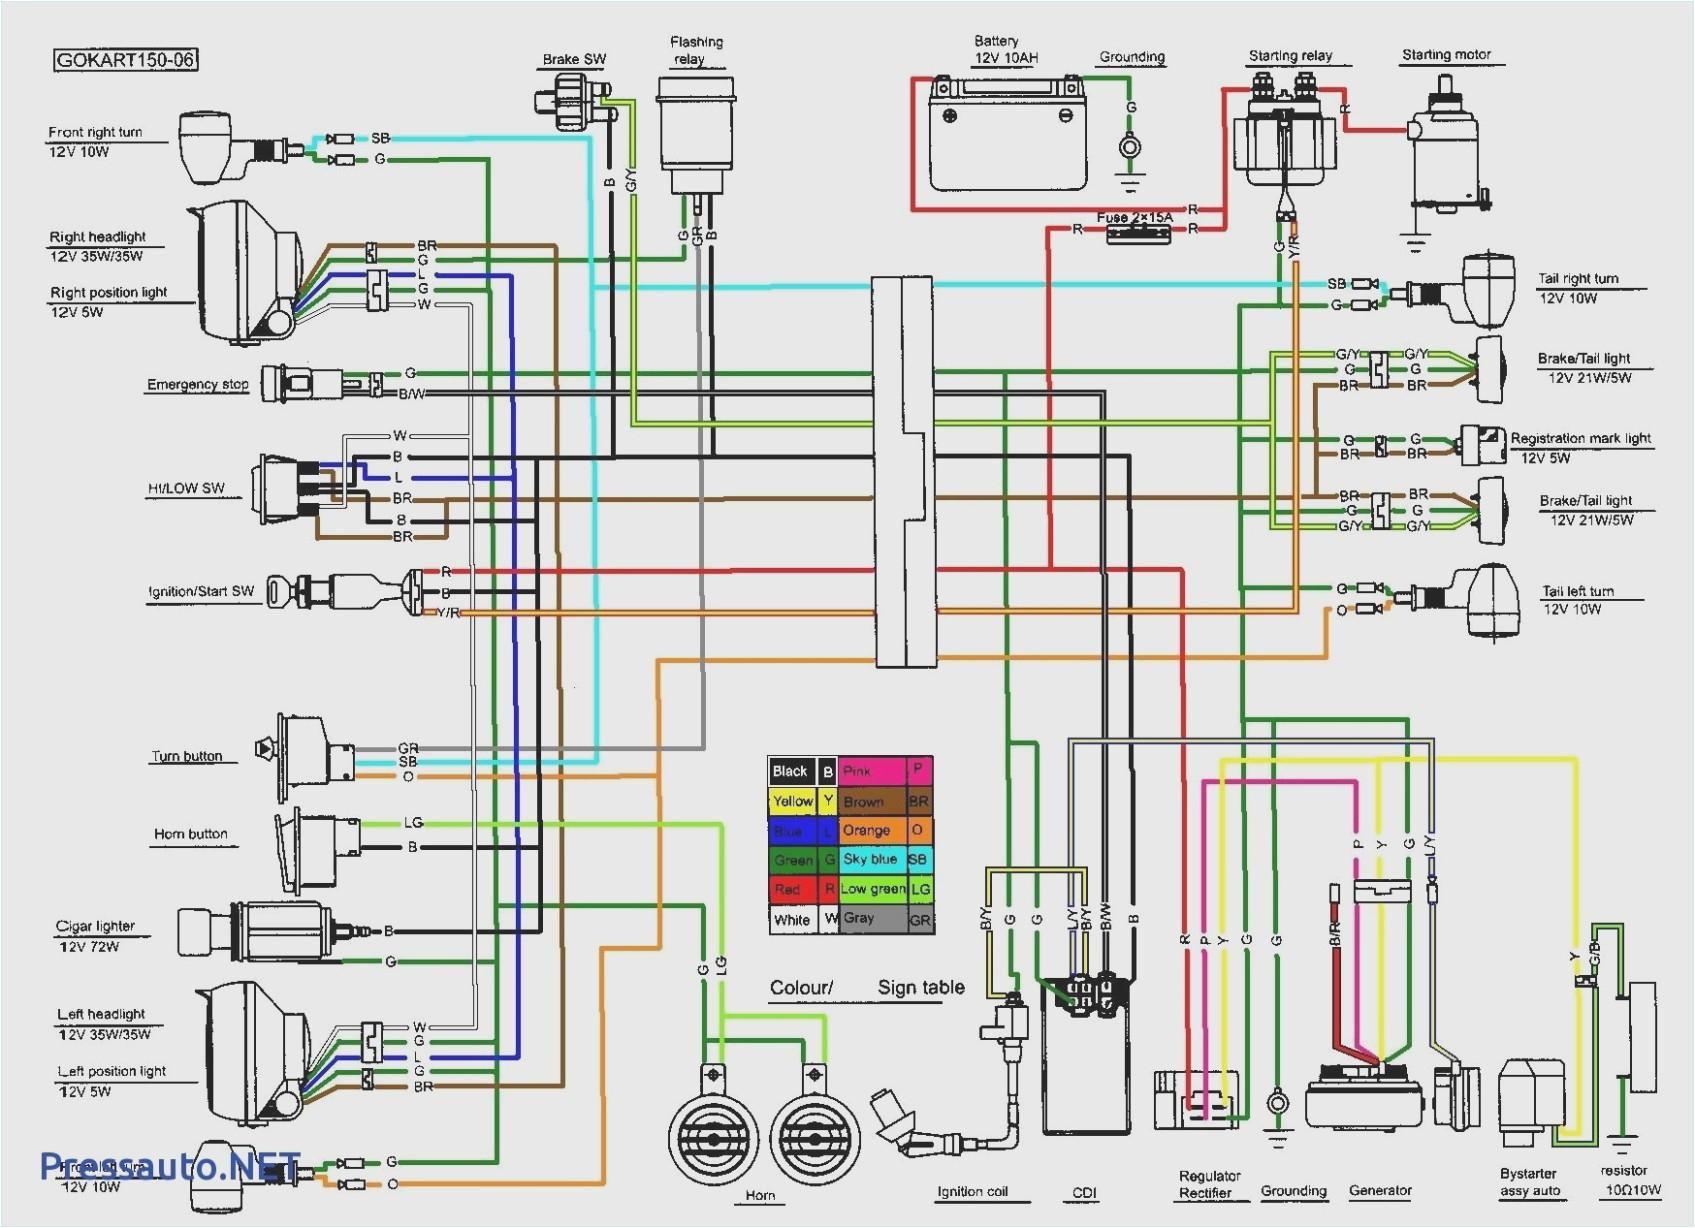 taotao 7cc scooter wiring diagram all motorcycle taotao wiring diagram jpg